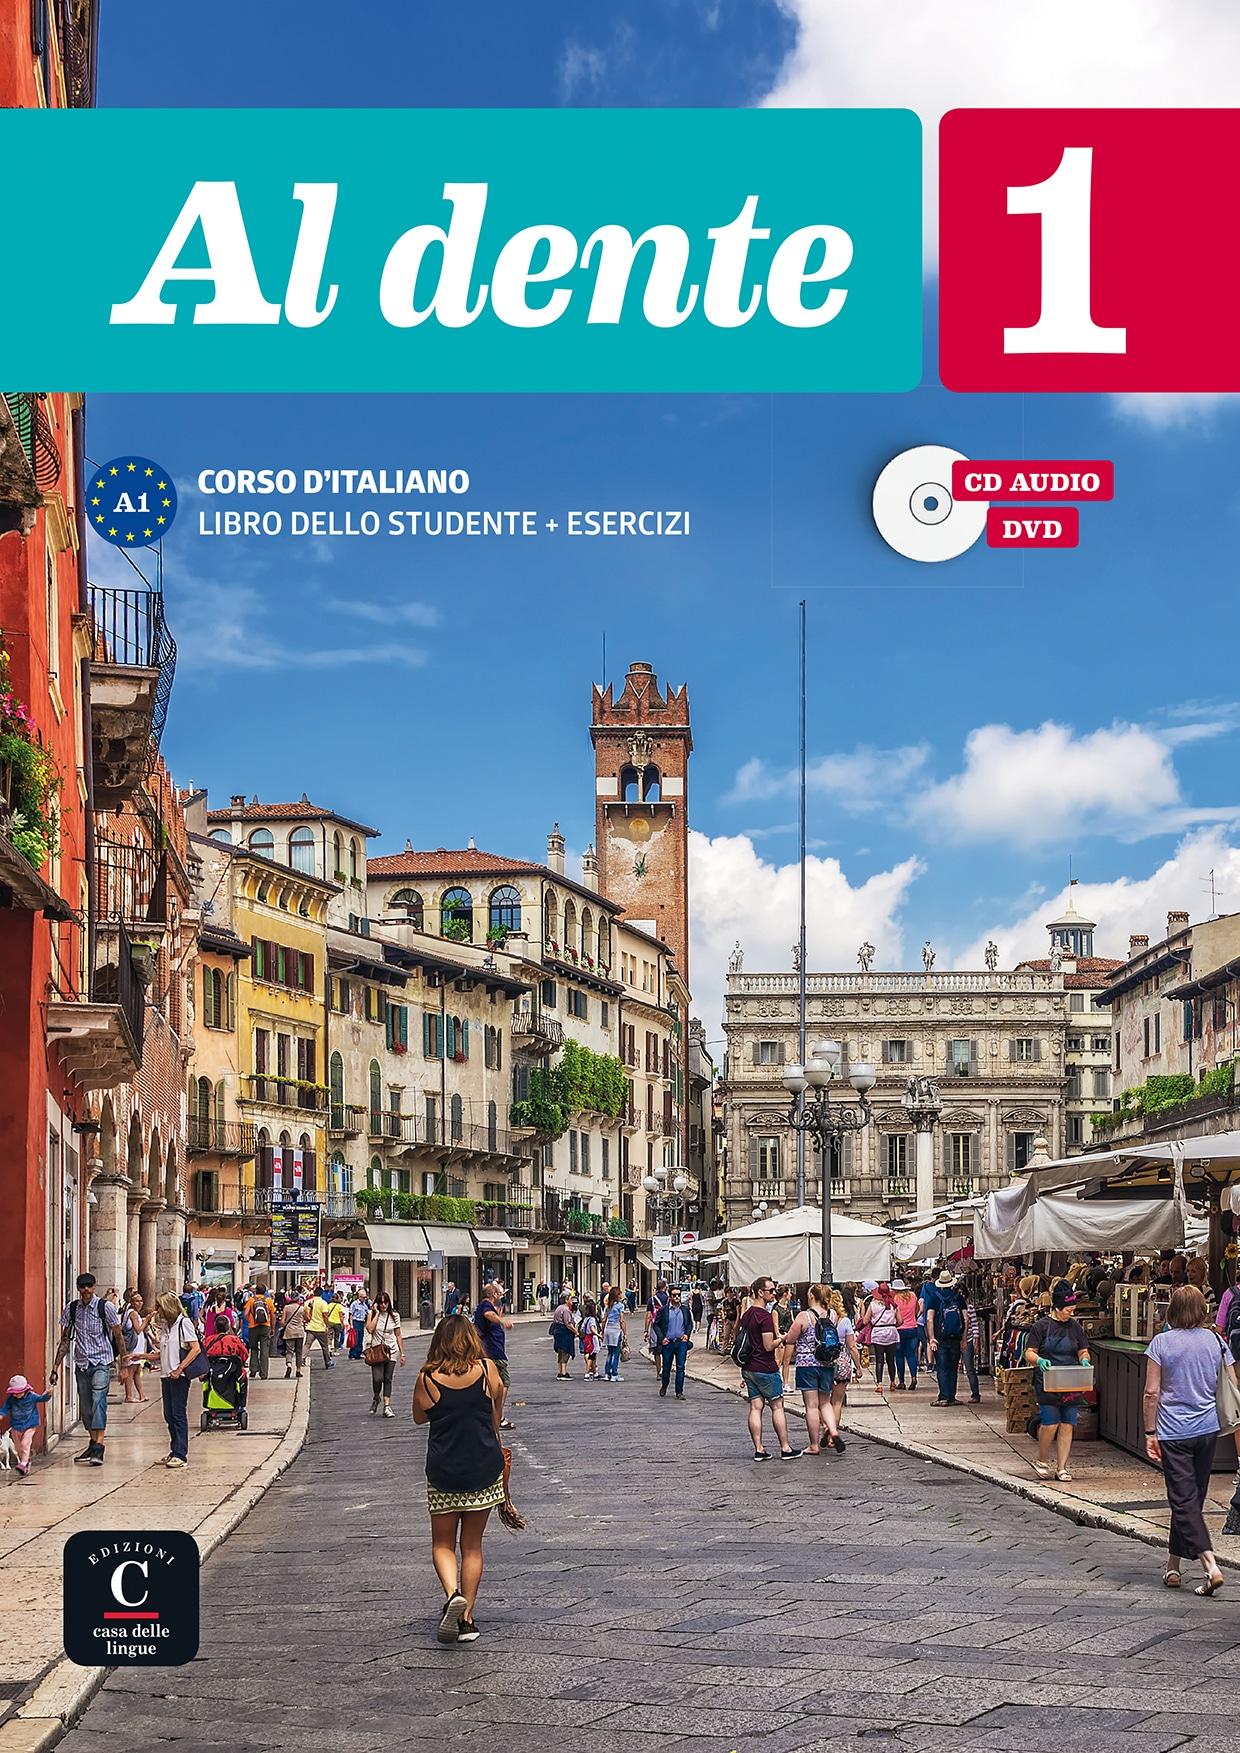 AL DENTE A1 Libro + esercizi+CD+DVD udžbenik i radna bilježnica za talijanski jezik, 1. i/ili 2. razred srednje škole autora Marilisa Birello, Simone Bonafaccia, Andrea Petri, Albert Vilagrasa